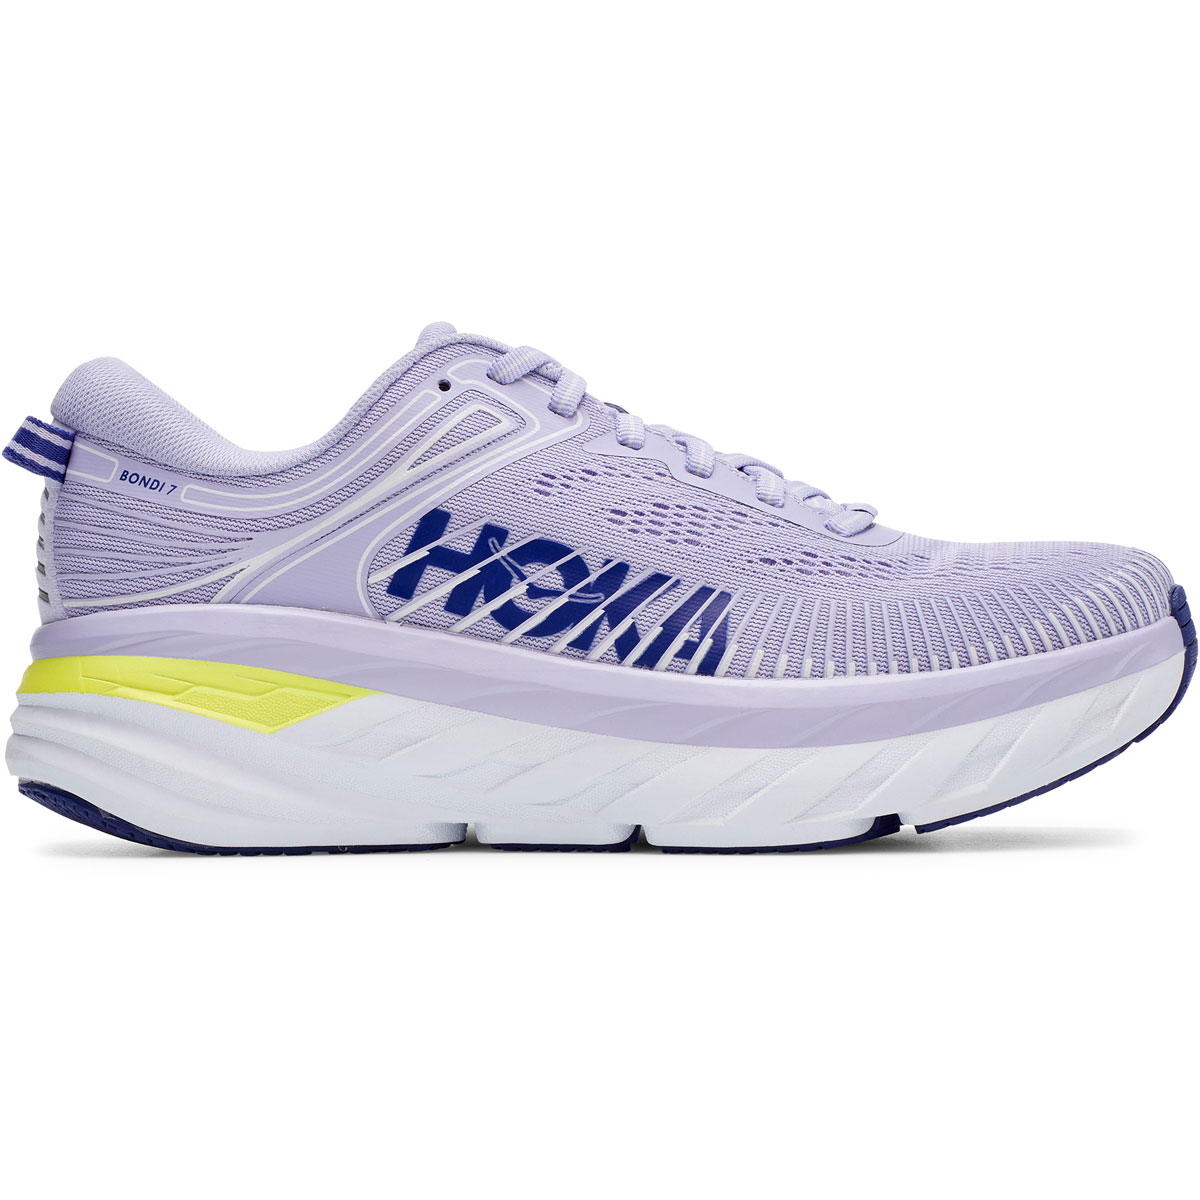 Women's Hoka One One Bondi 7 Running Shoe - Color: Purple Heather/Clematis Blue - Size: 5 - Width: Regular, Purple Heather/Clematis Blue, large, image 1